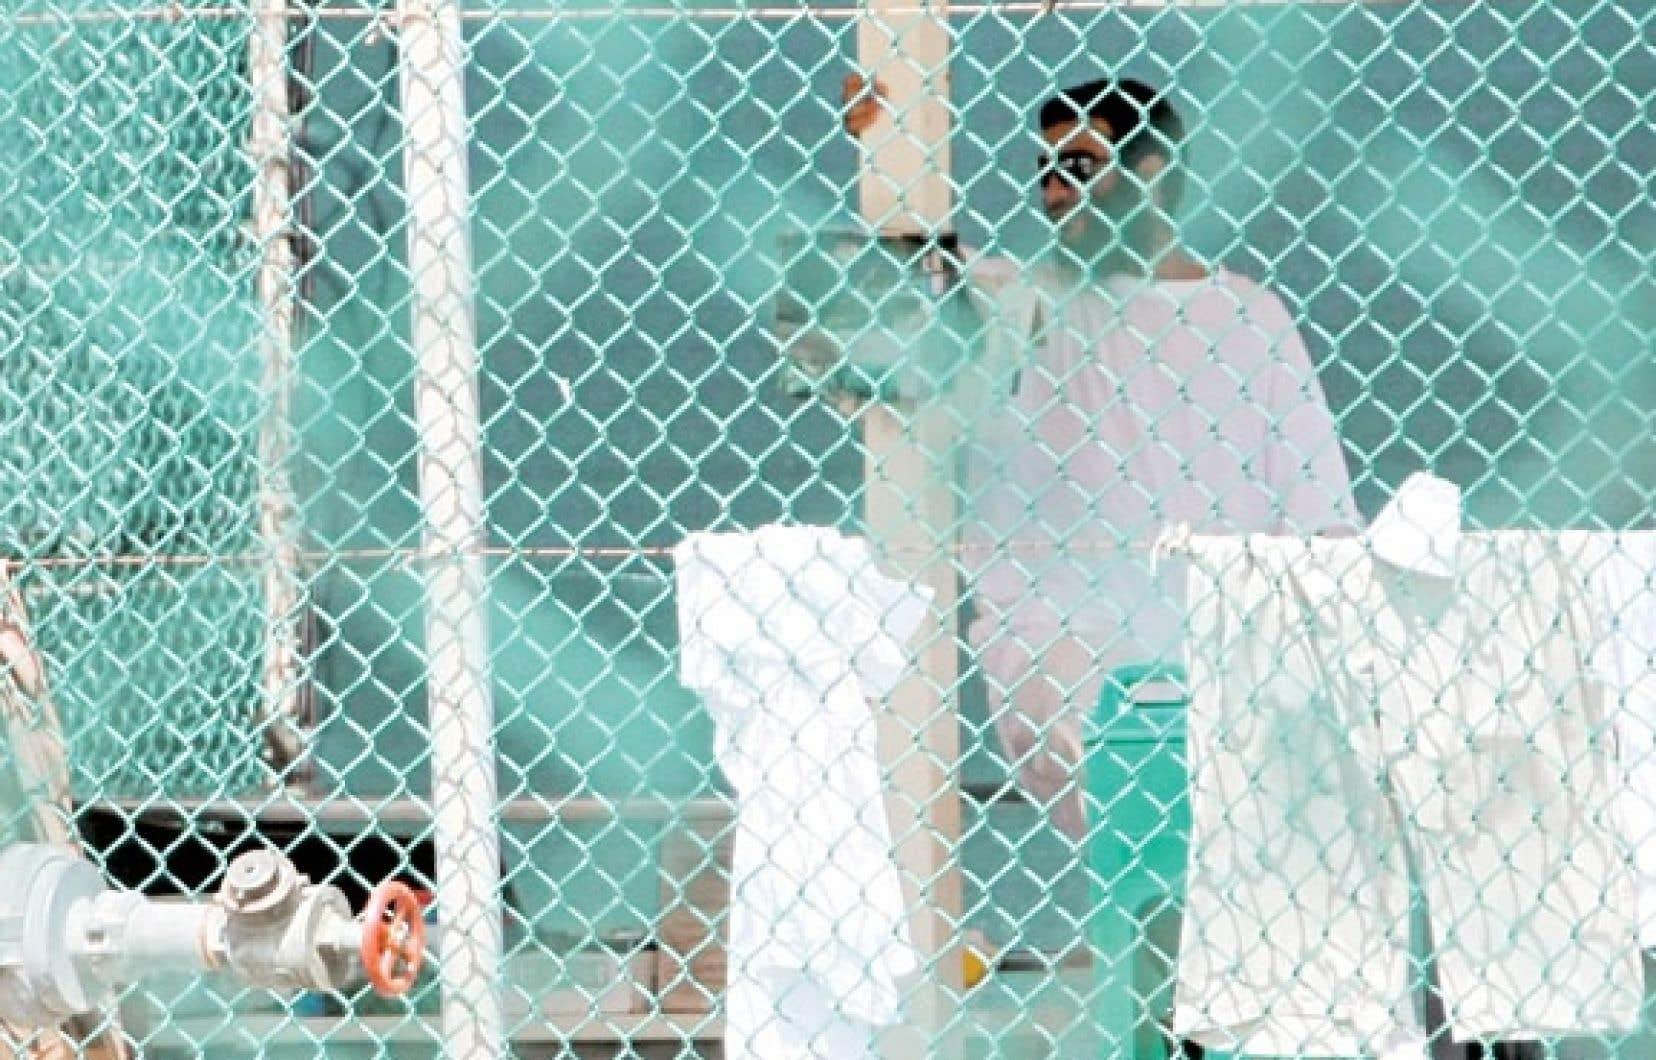 Omar Khadr, à la base militaire de Guantánamo, en octobre 2010.